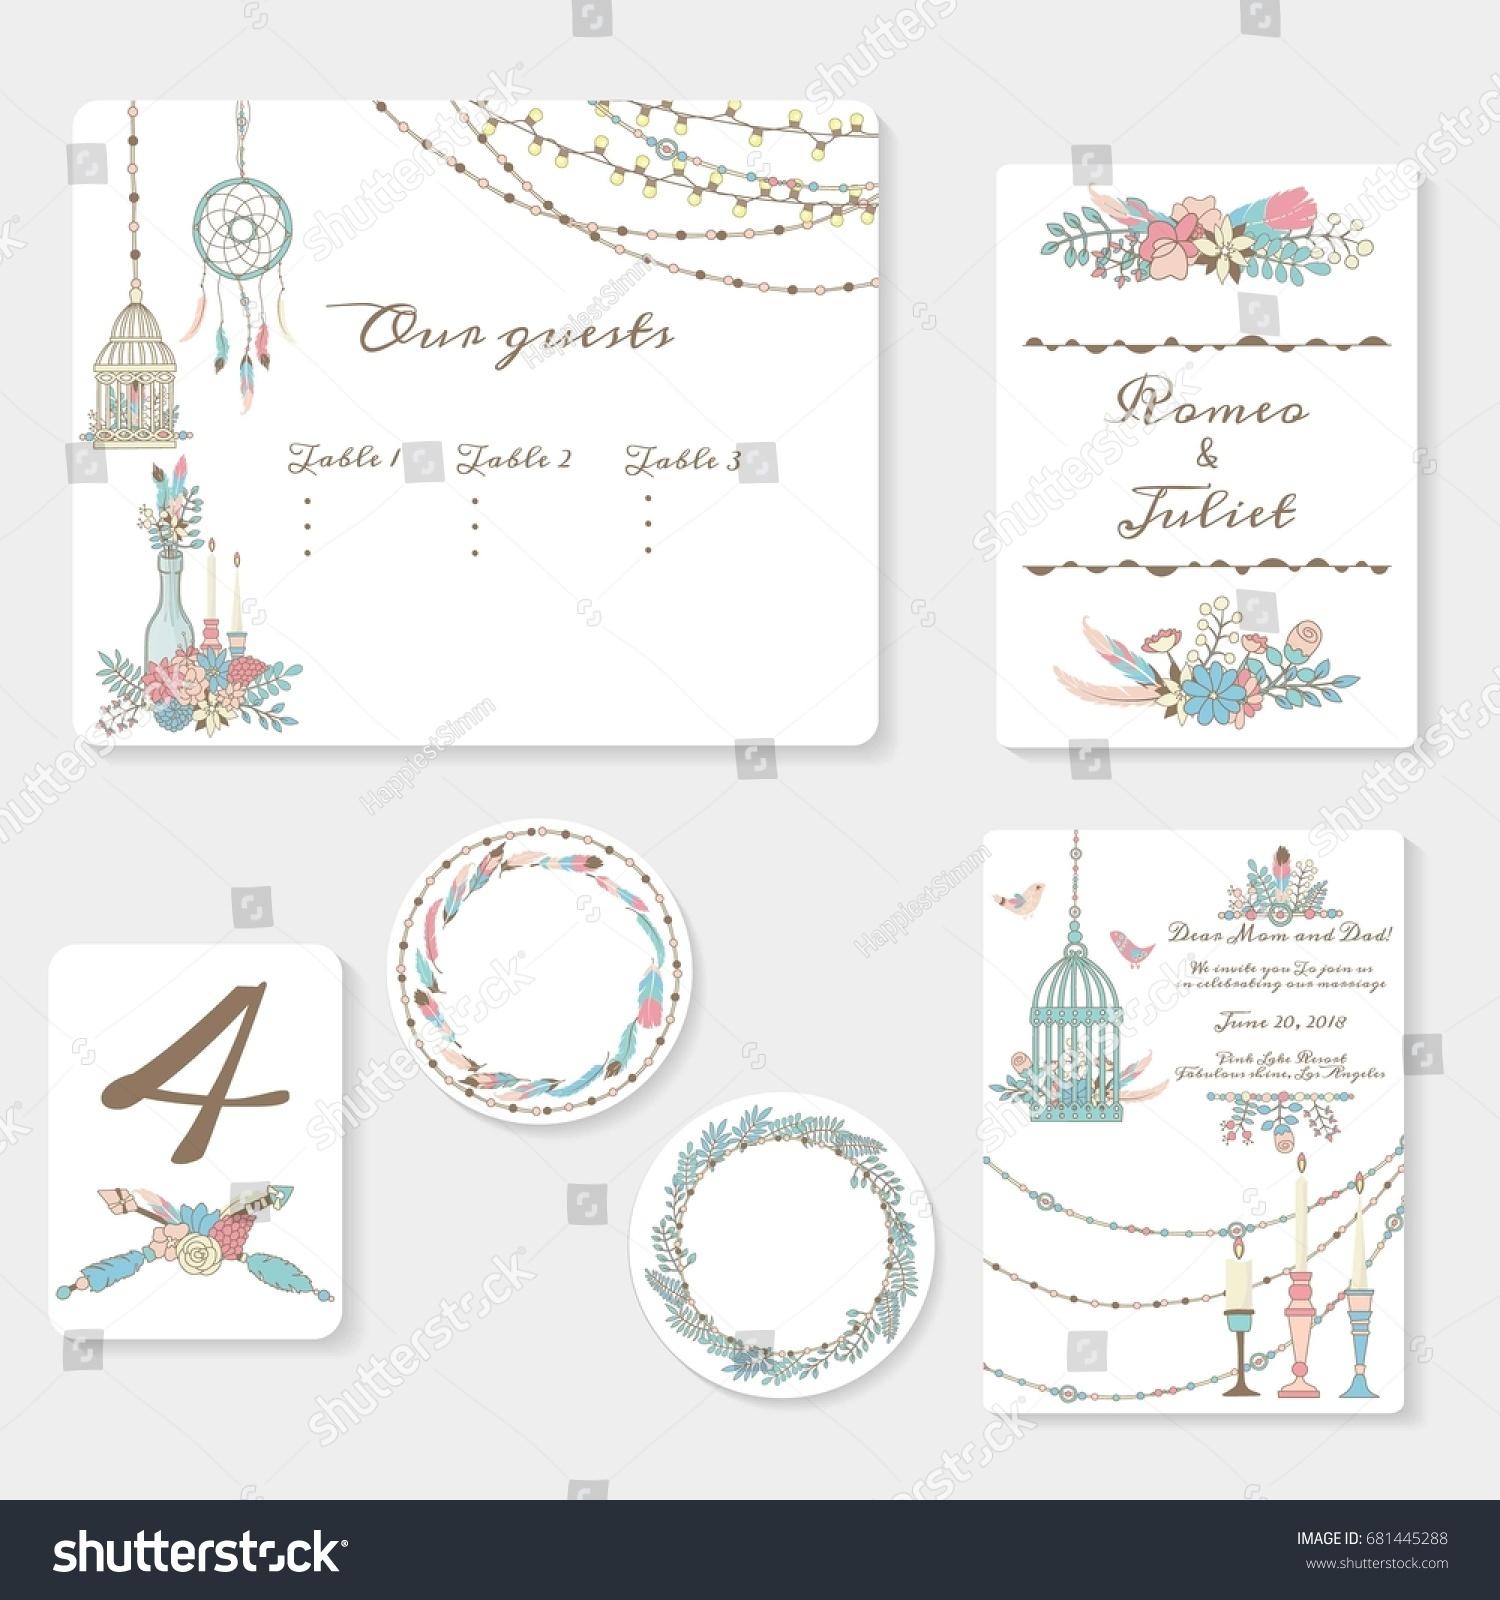 Wedding Invitation Cards Suite Tender Garden Stock Vector 681445288 ...